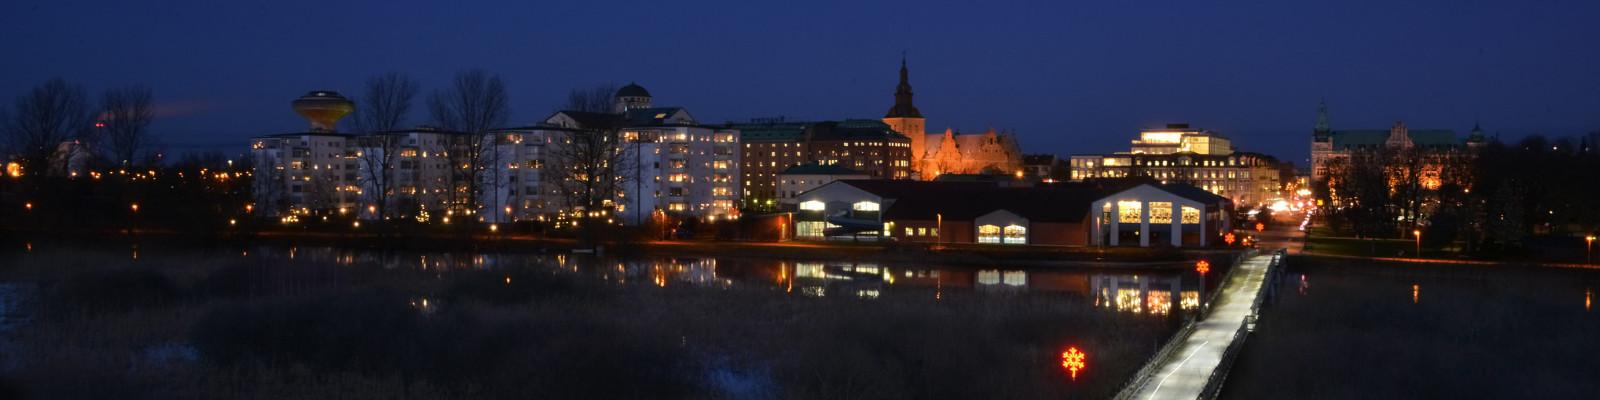 Kristianstadstad---kvällsvy-I---Claes-Sandén---1600x400.jpg